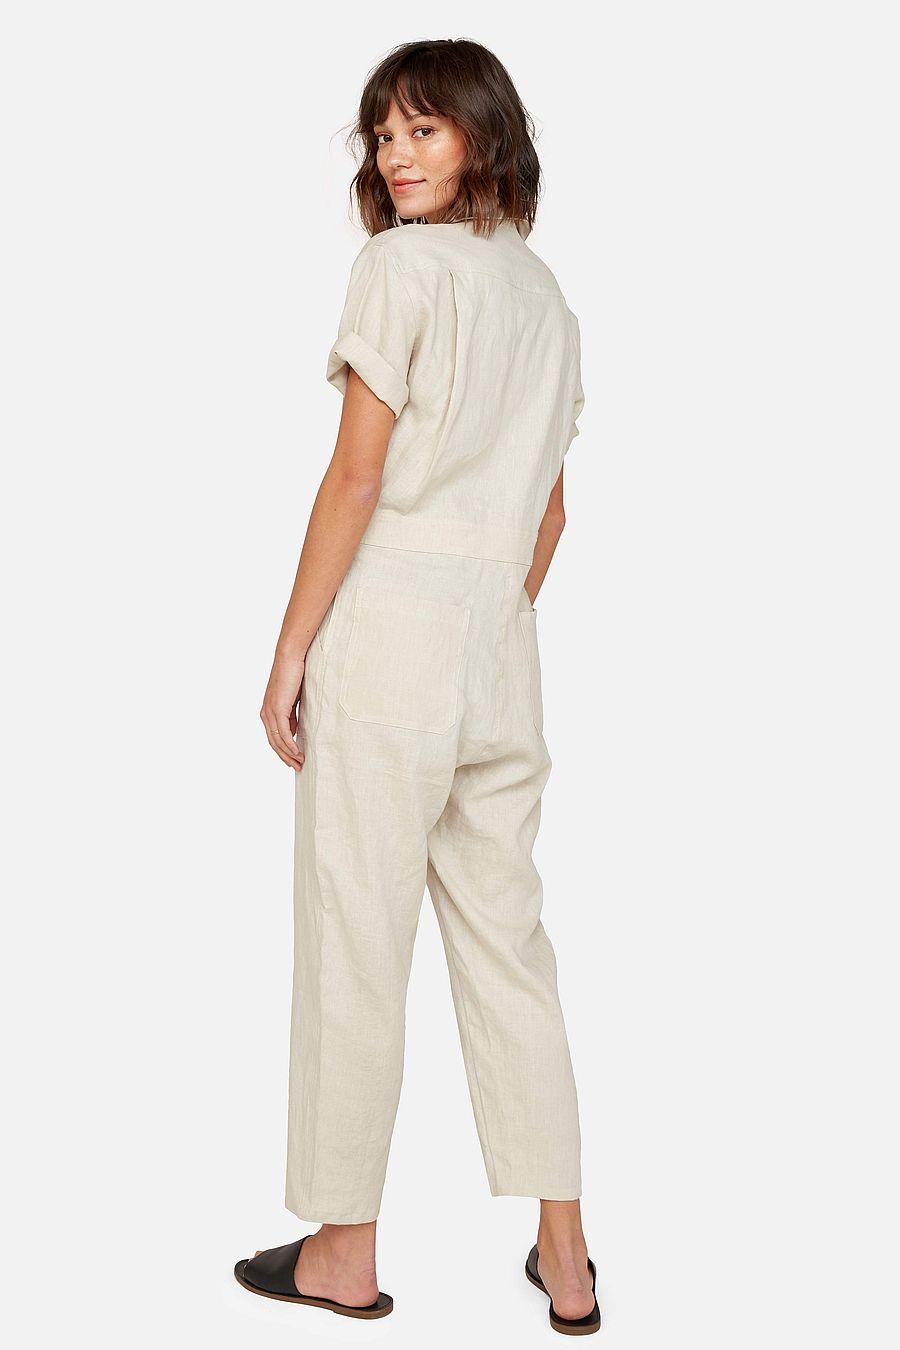 MATE The Label Linen Short Sleeve Jumpsuit - NATURAL